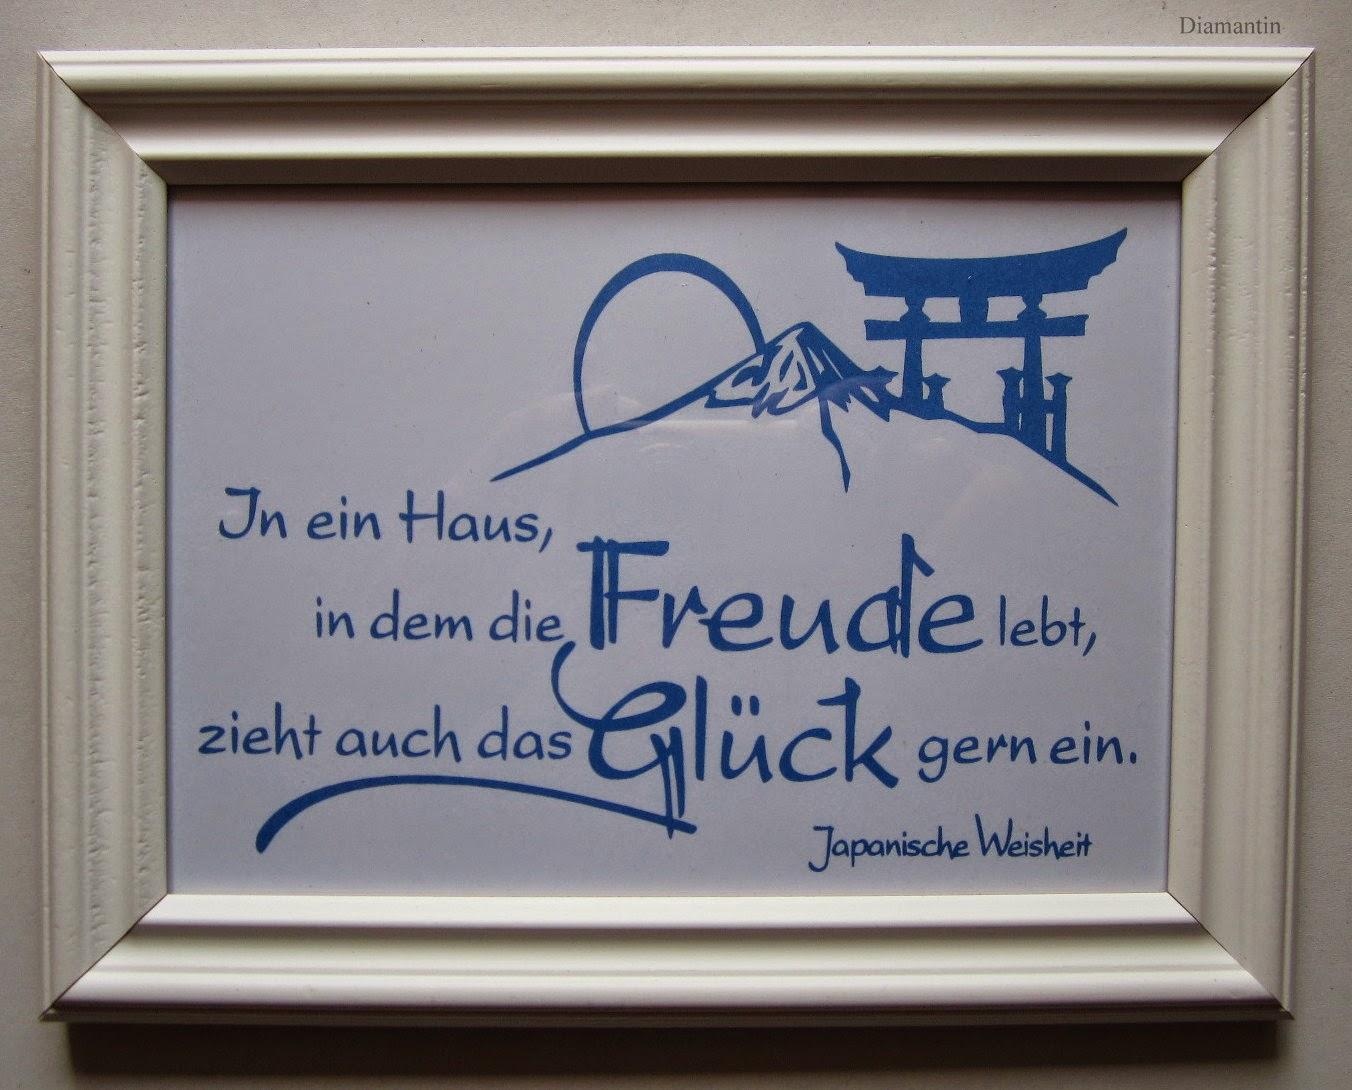 Diamantin´s Hobbywelt: Spruch-Bilderrahmen